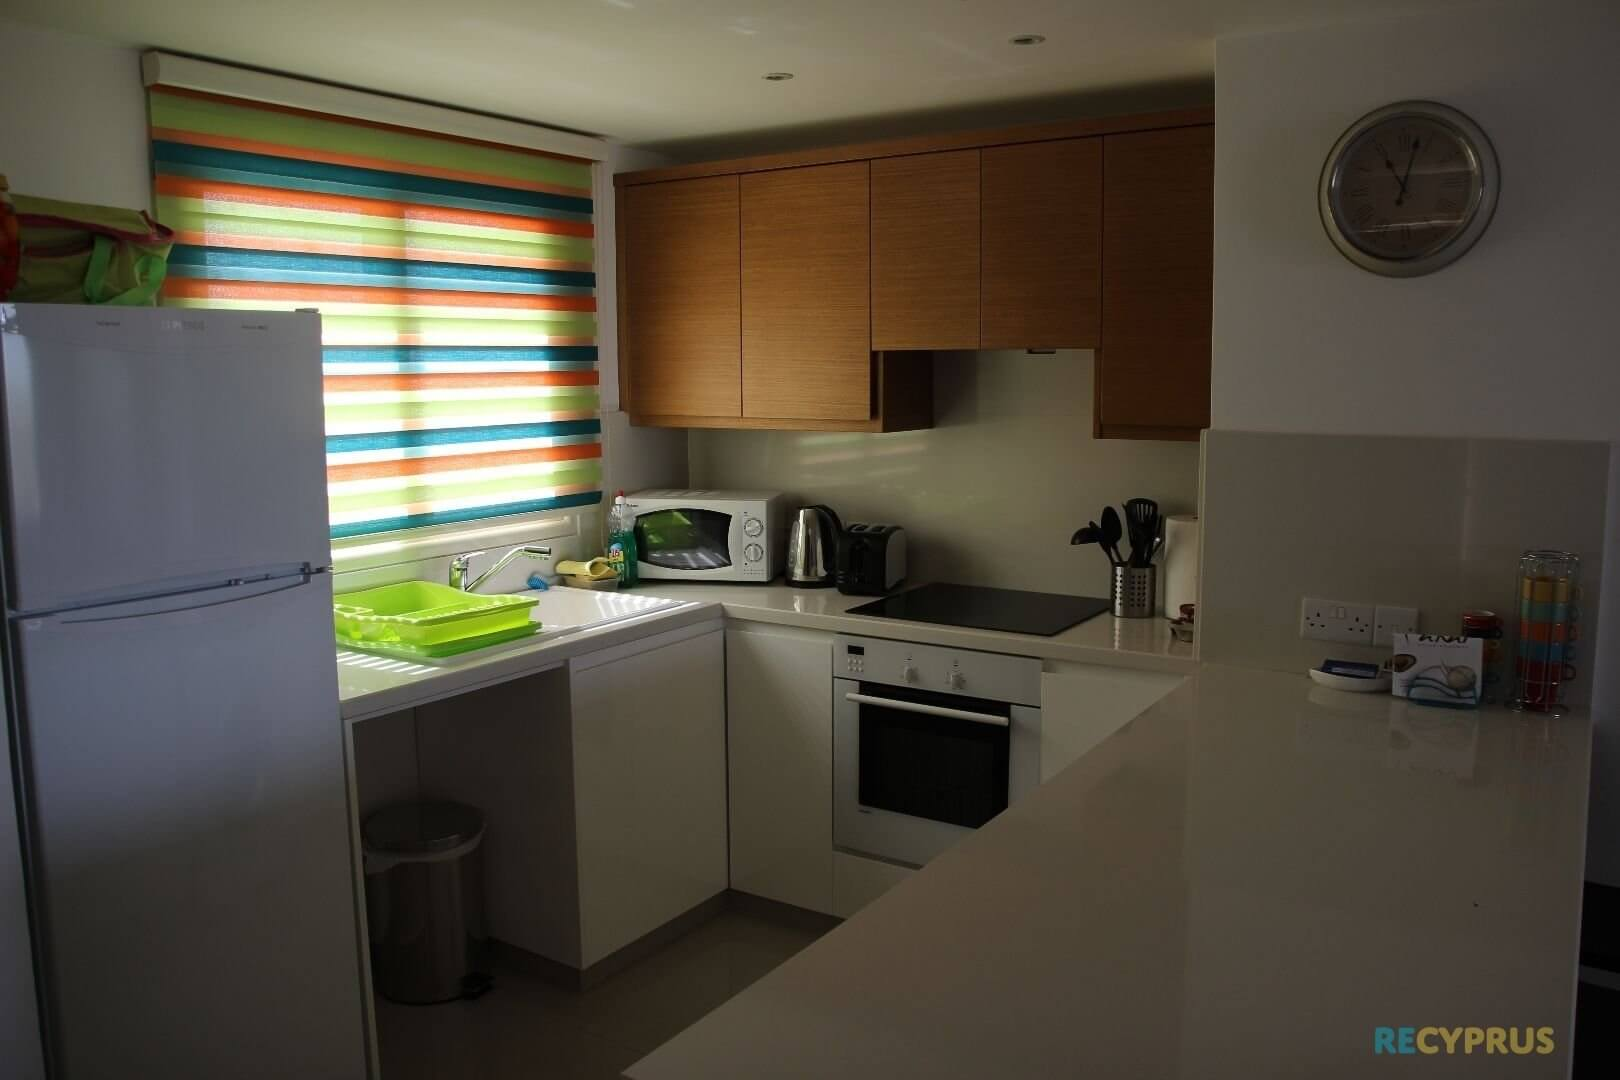 Apartment for sale Kapparis Famagusta Cyprus 4 3560